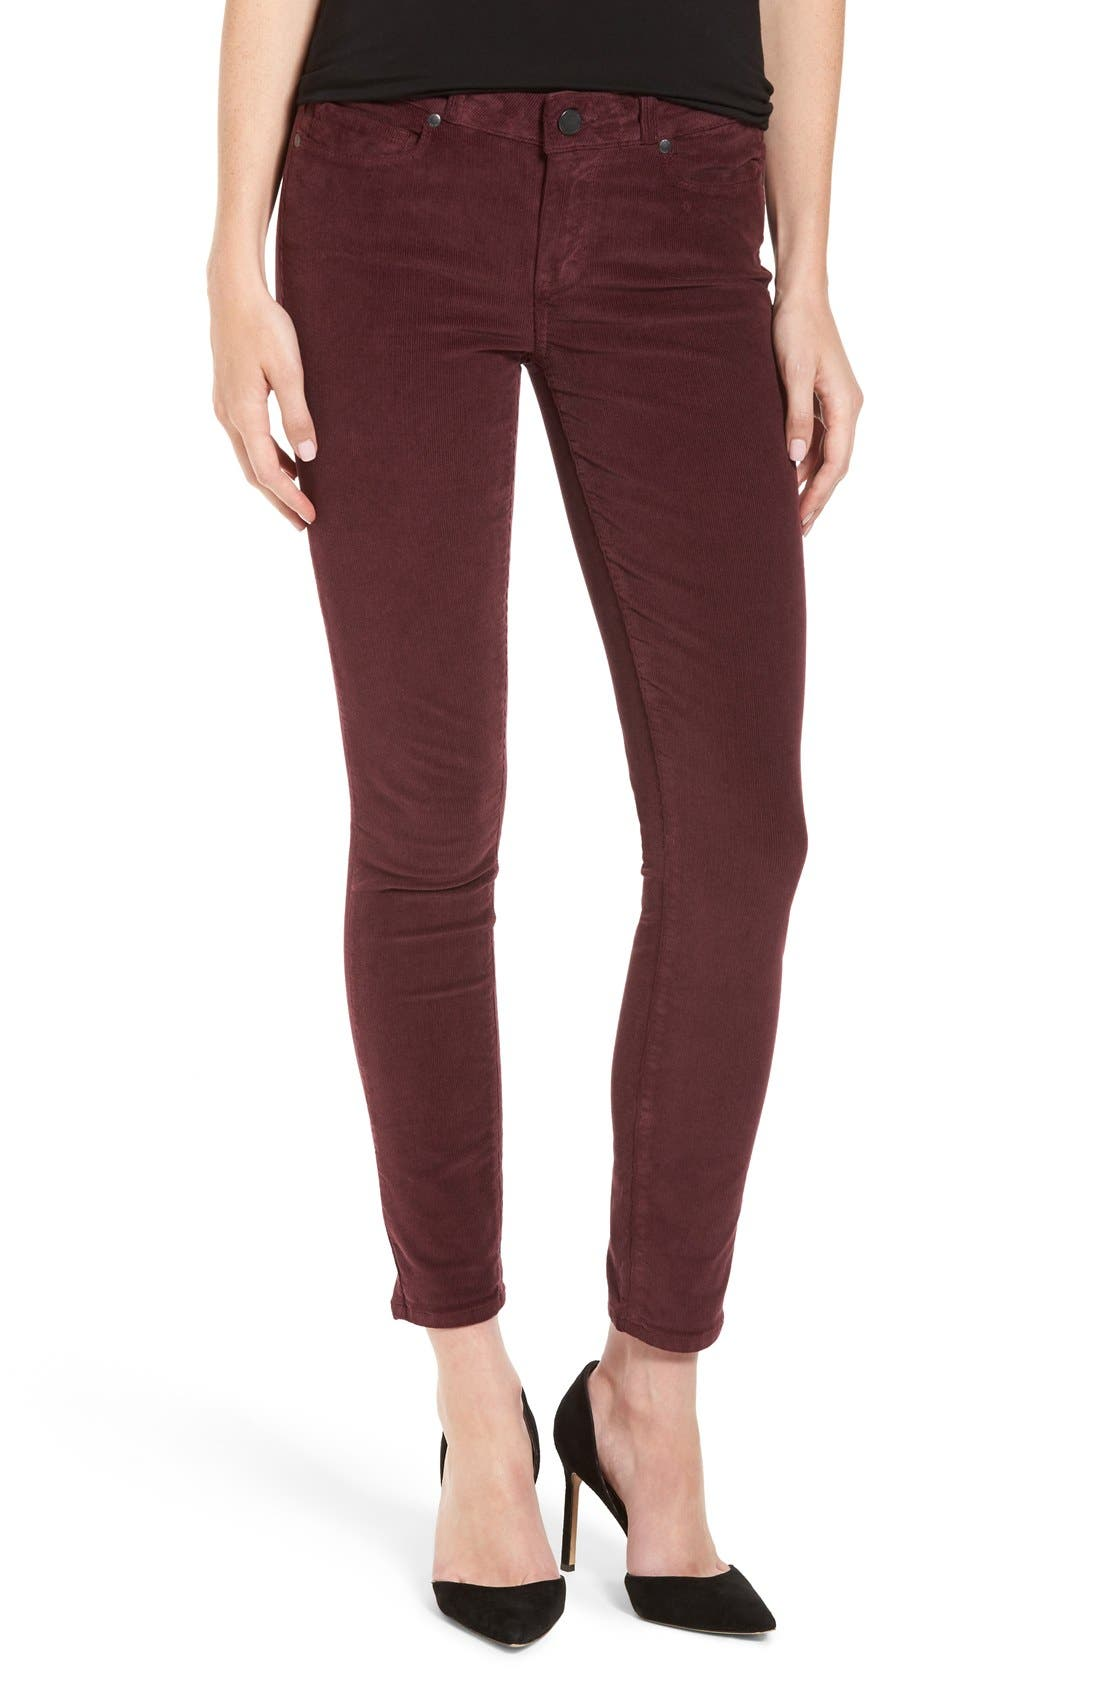 'Verdugo' Ankle Skinny Corduroy Pants,                             Main thumbnail 1, color,                             500